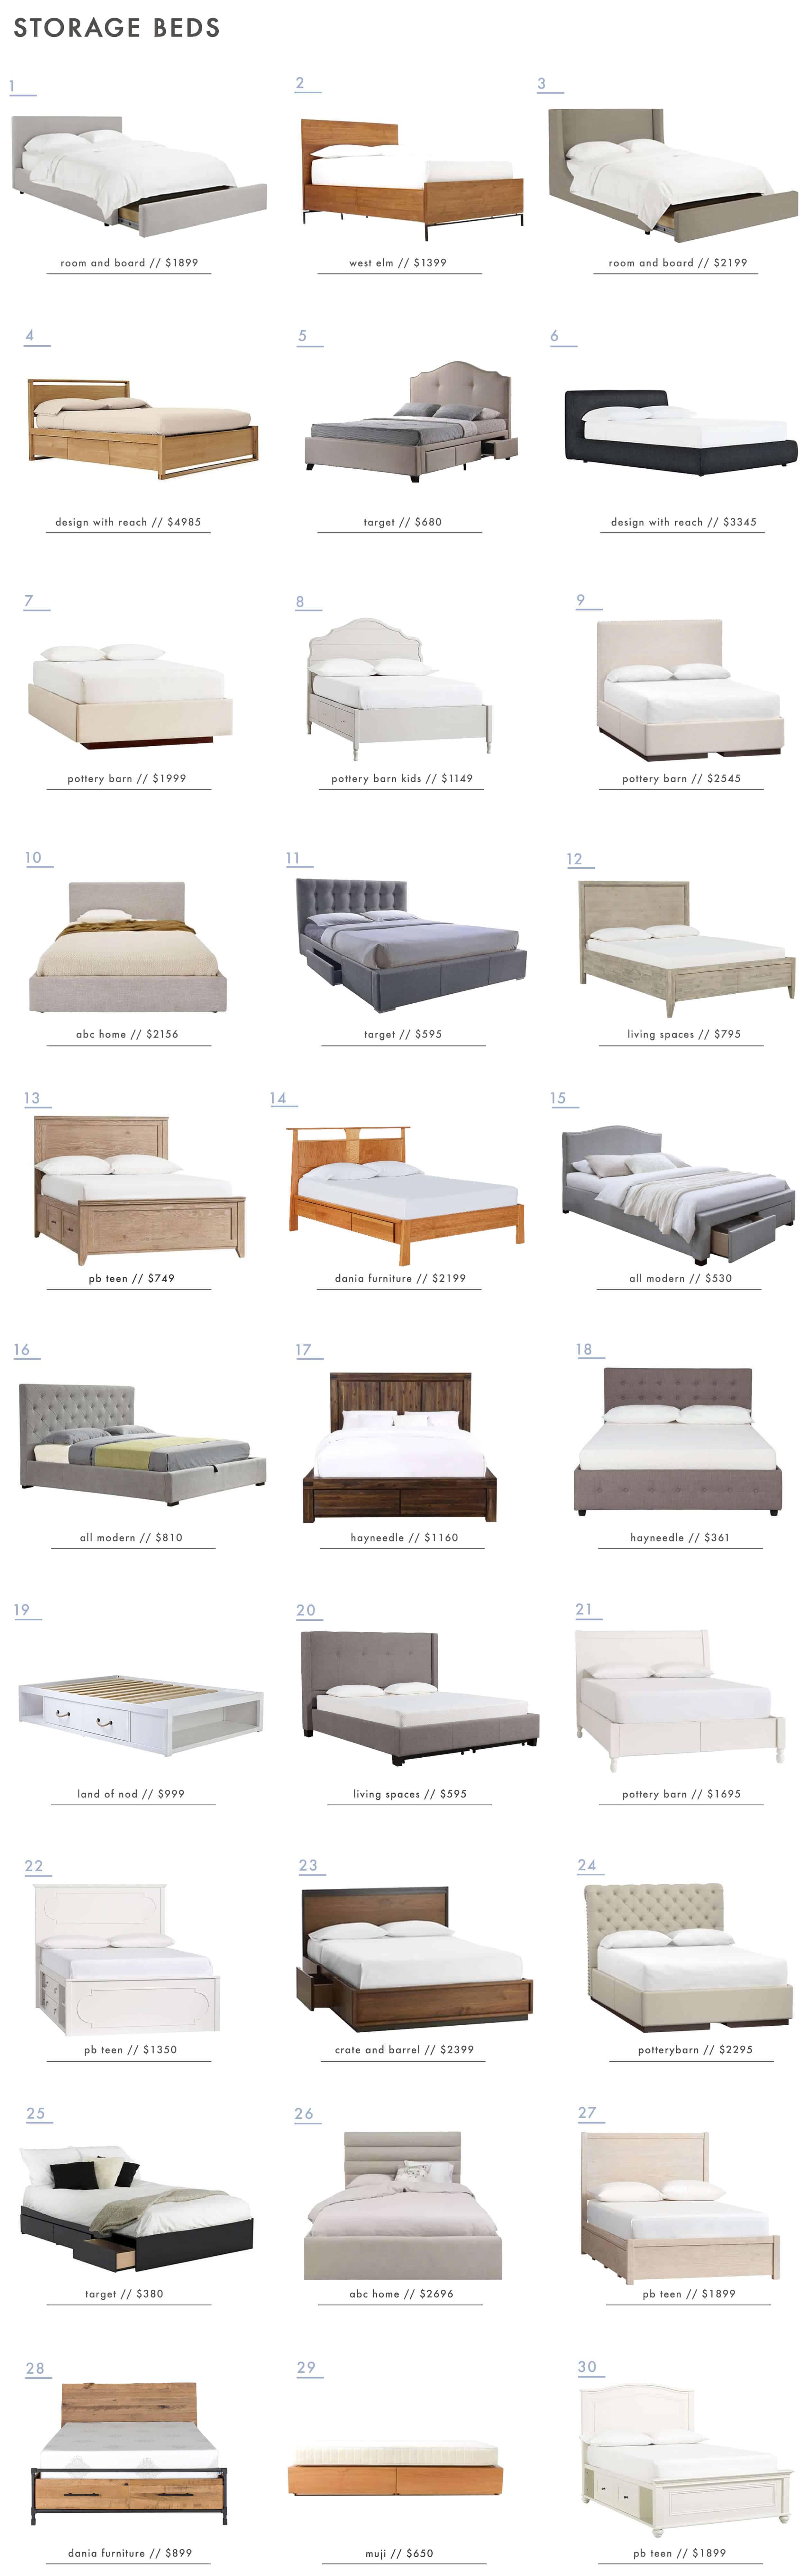 Emily Henderson Storage Beds Full Size Roundup 1